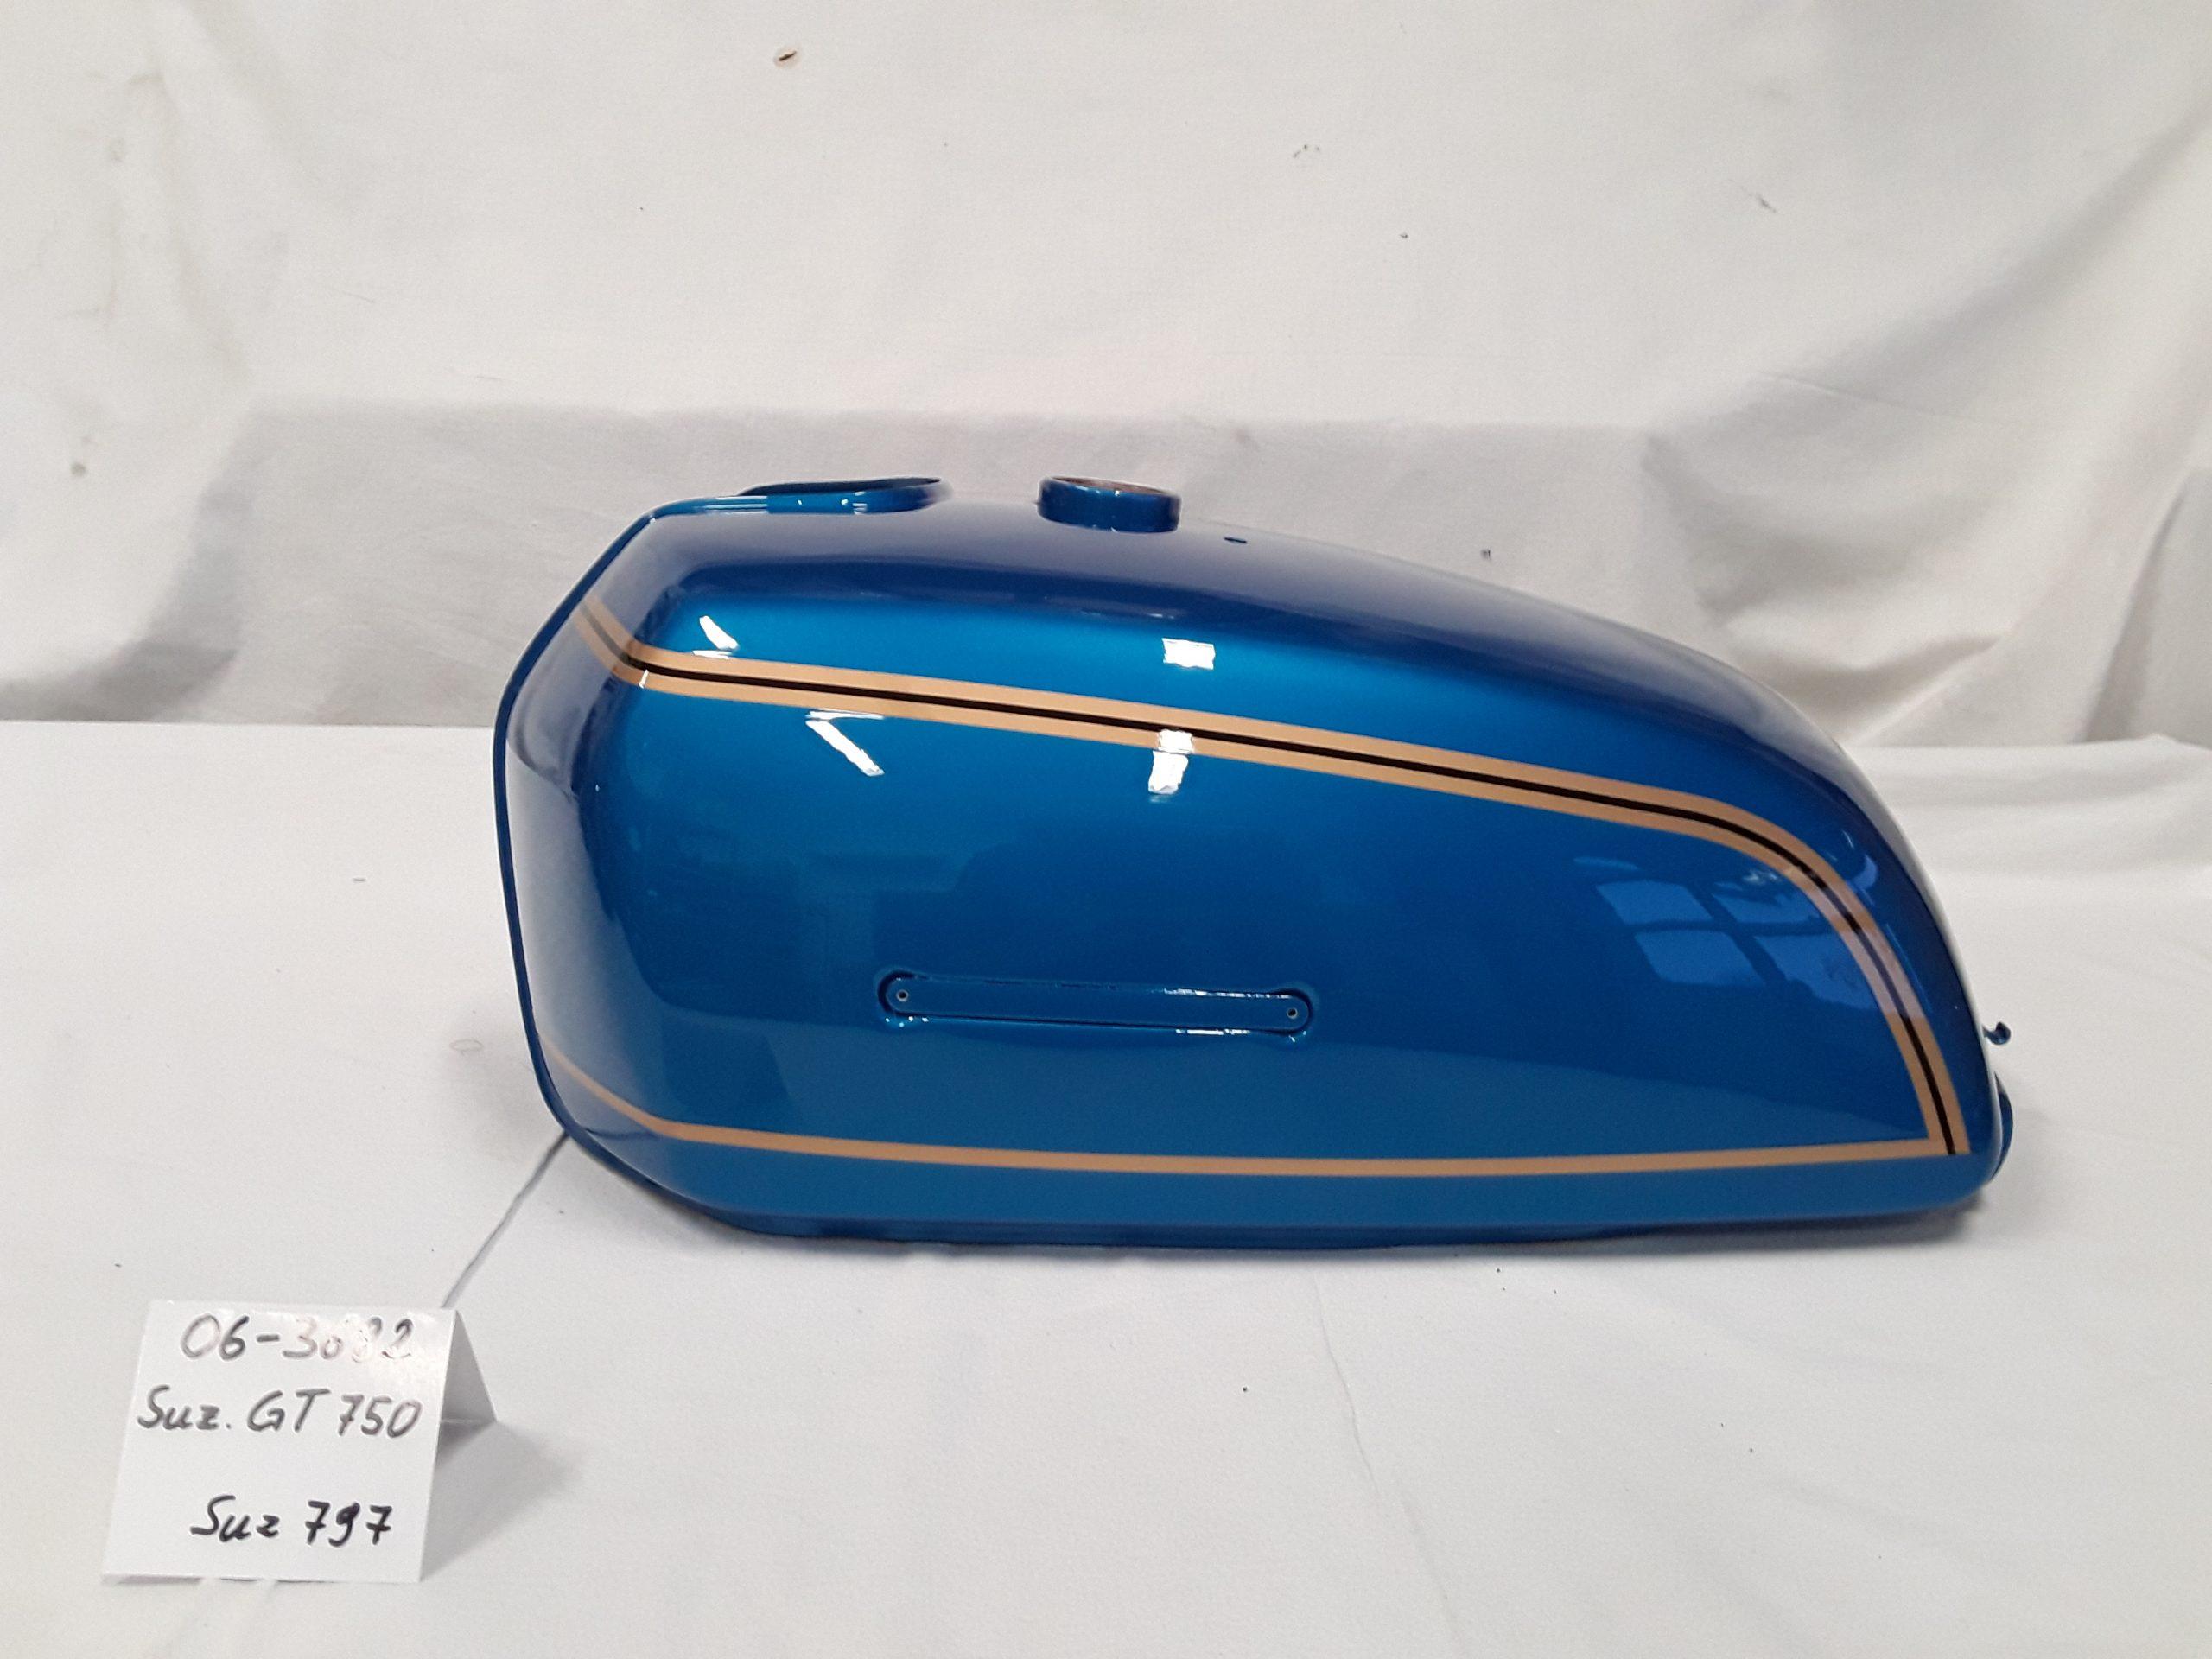 Suzuki GT750 in maui blue 797 RH-Lacke Lackiererei Motorradlackierung 06-3682